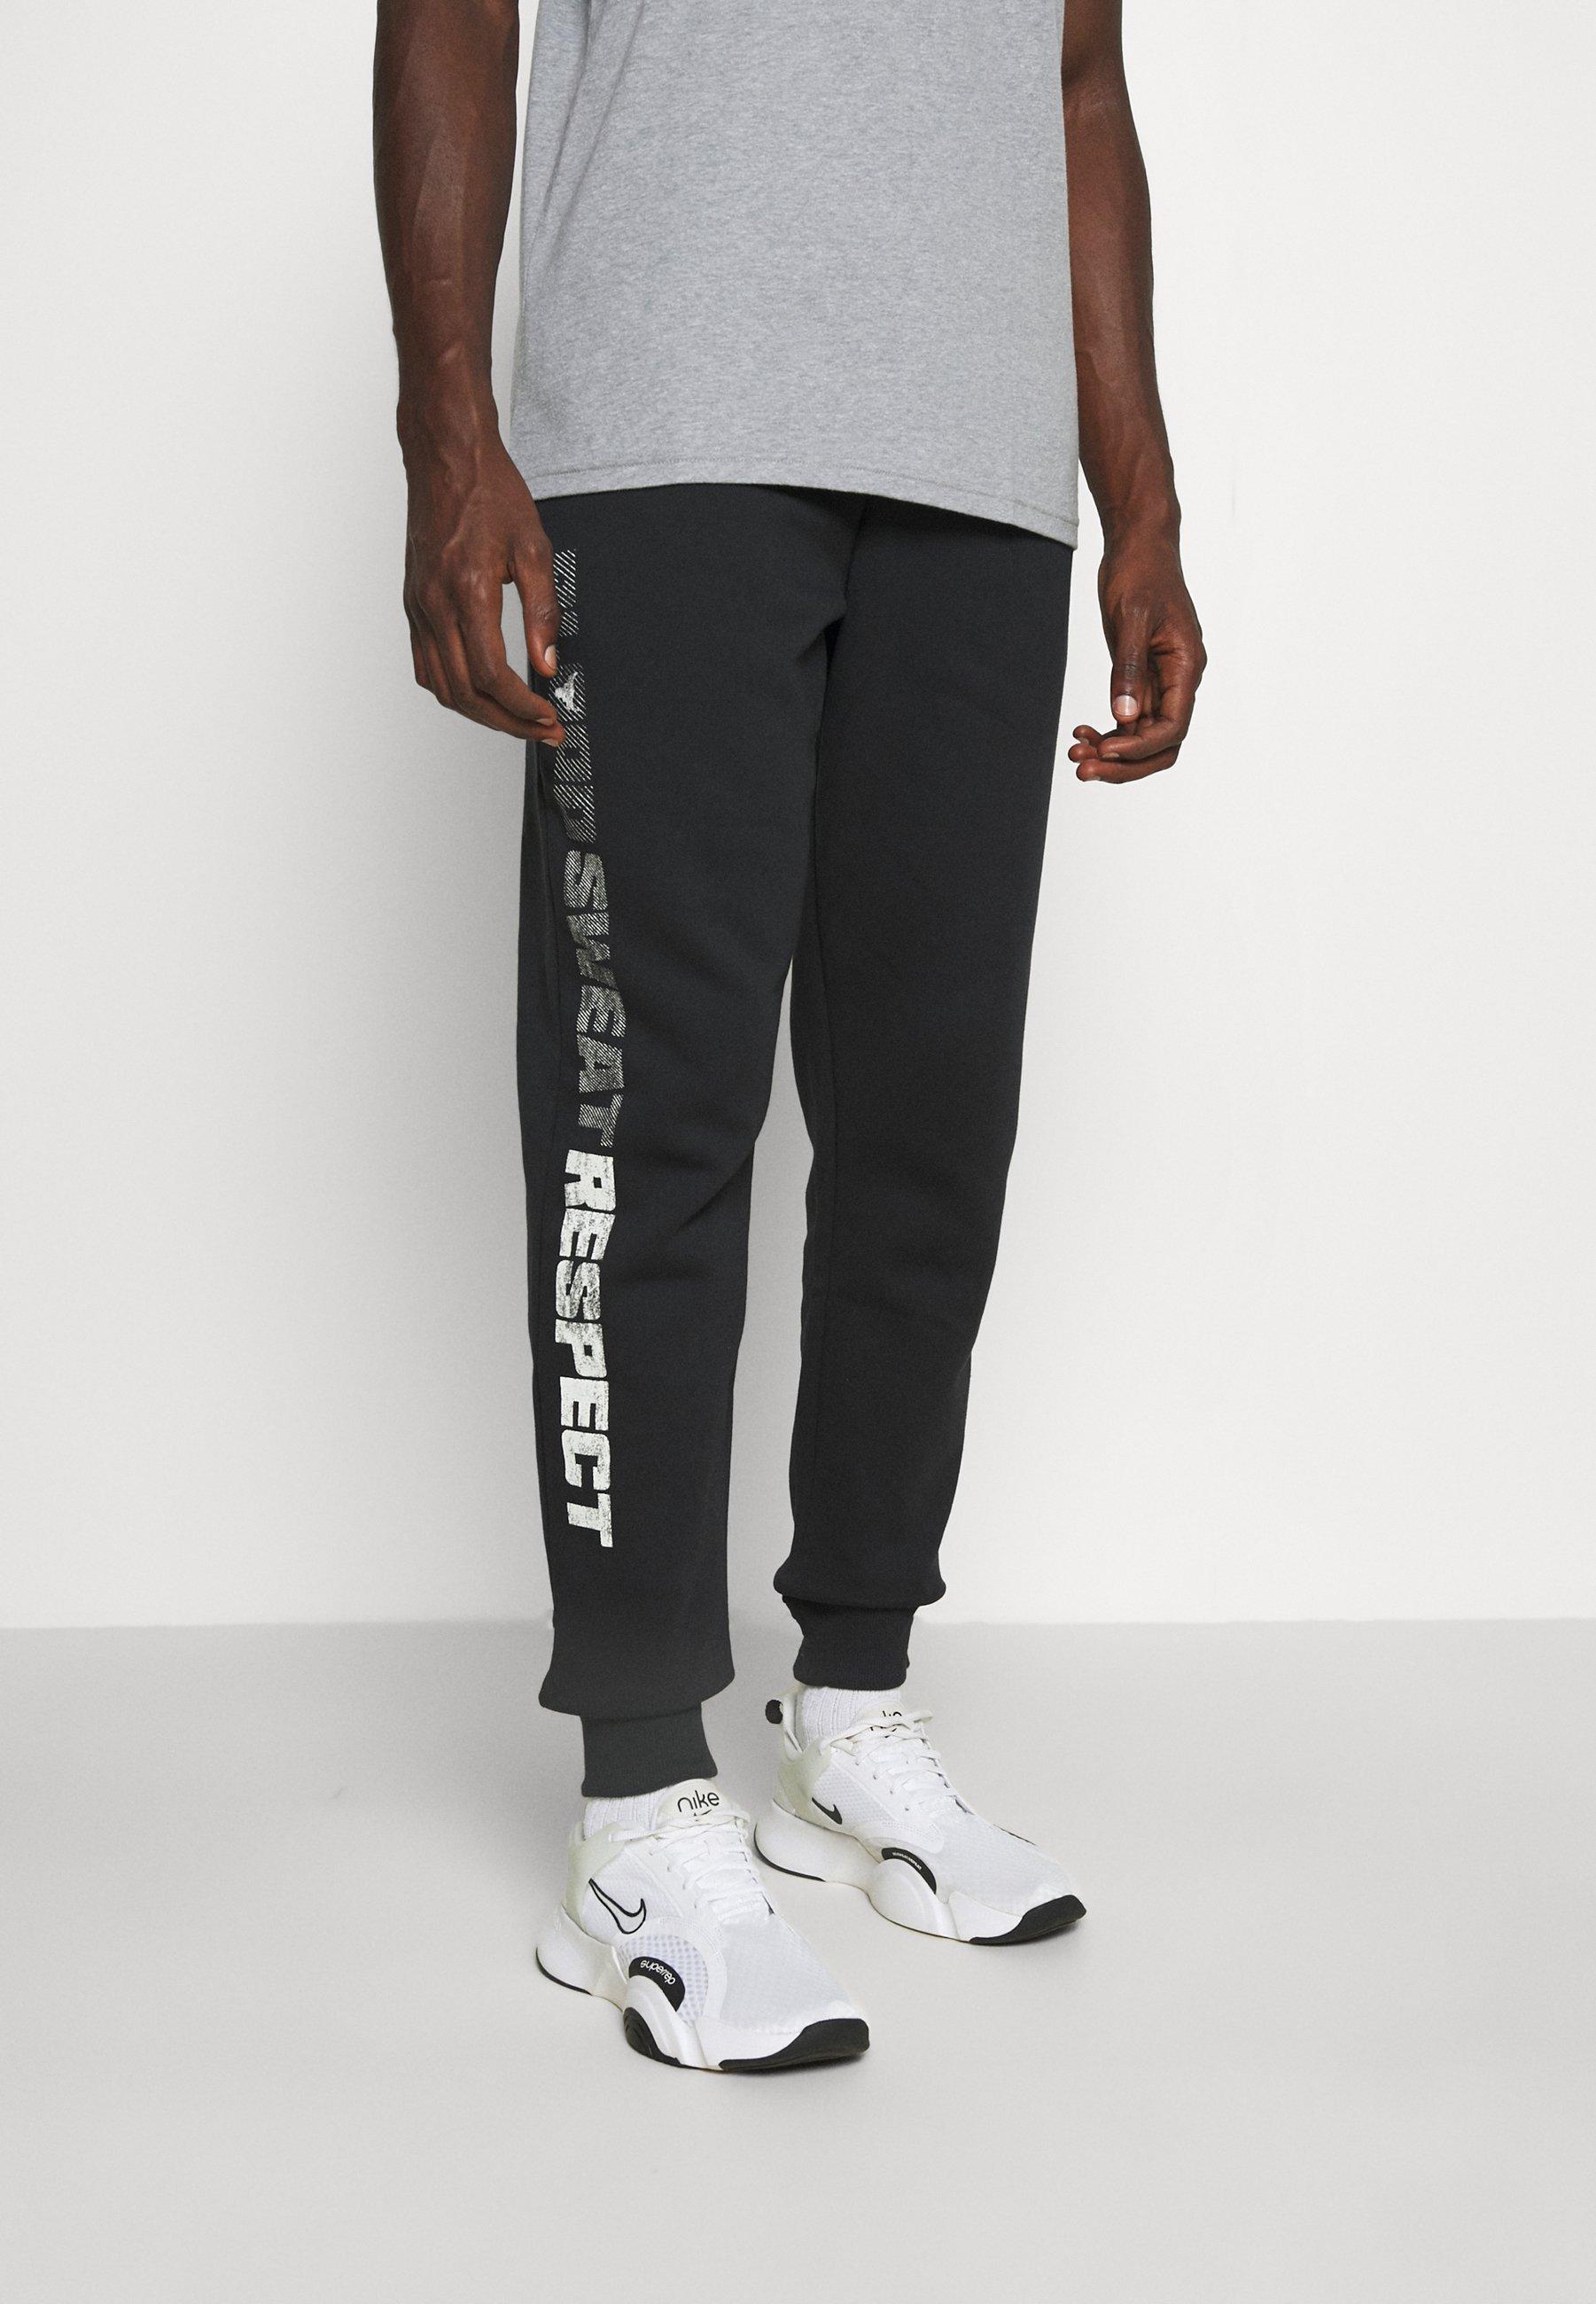 Uomo ROCK RIVAL - Pantaloni sportivi